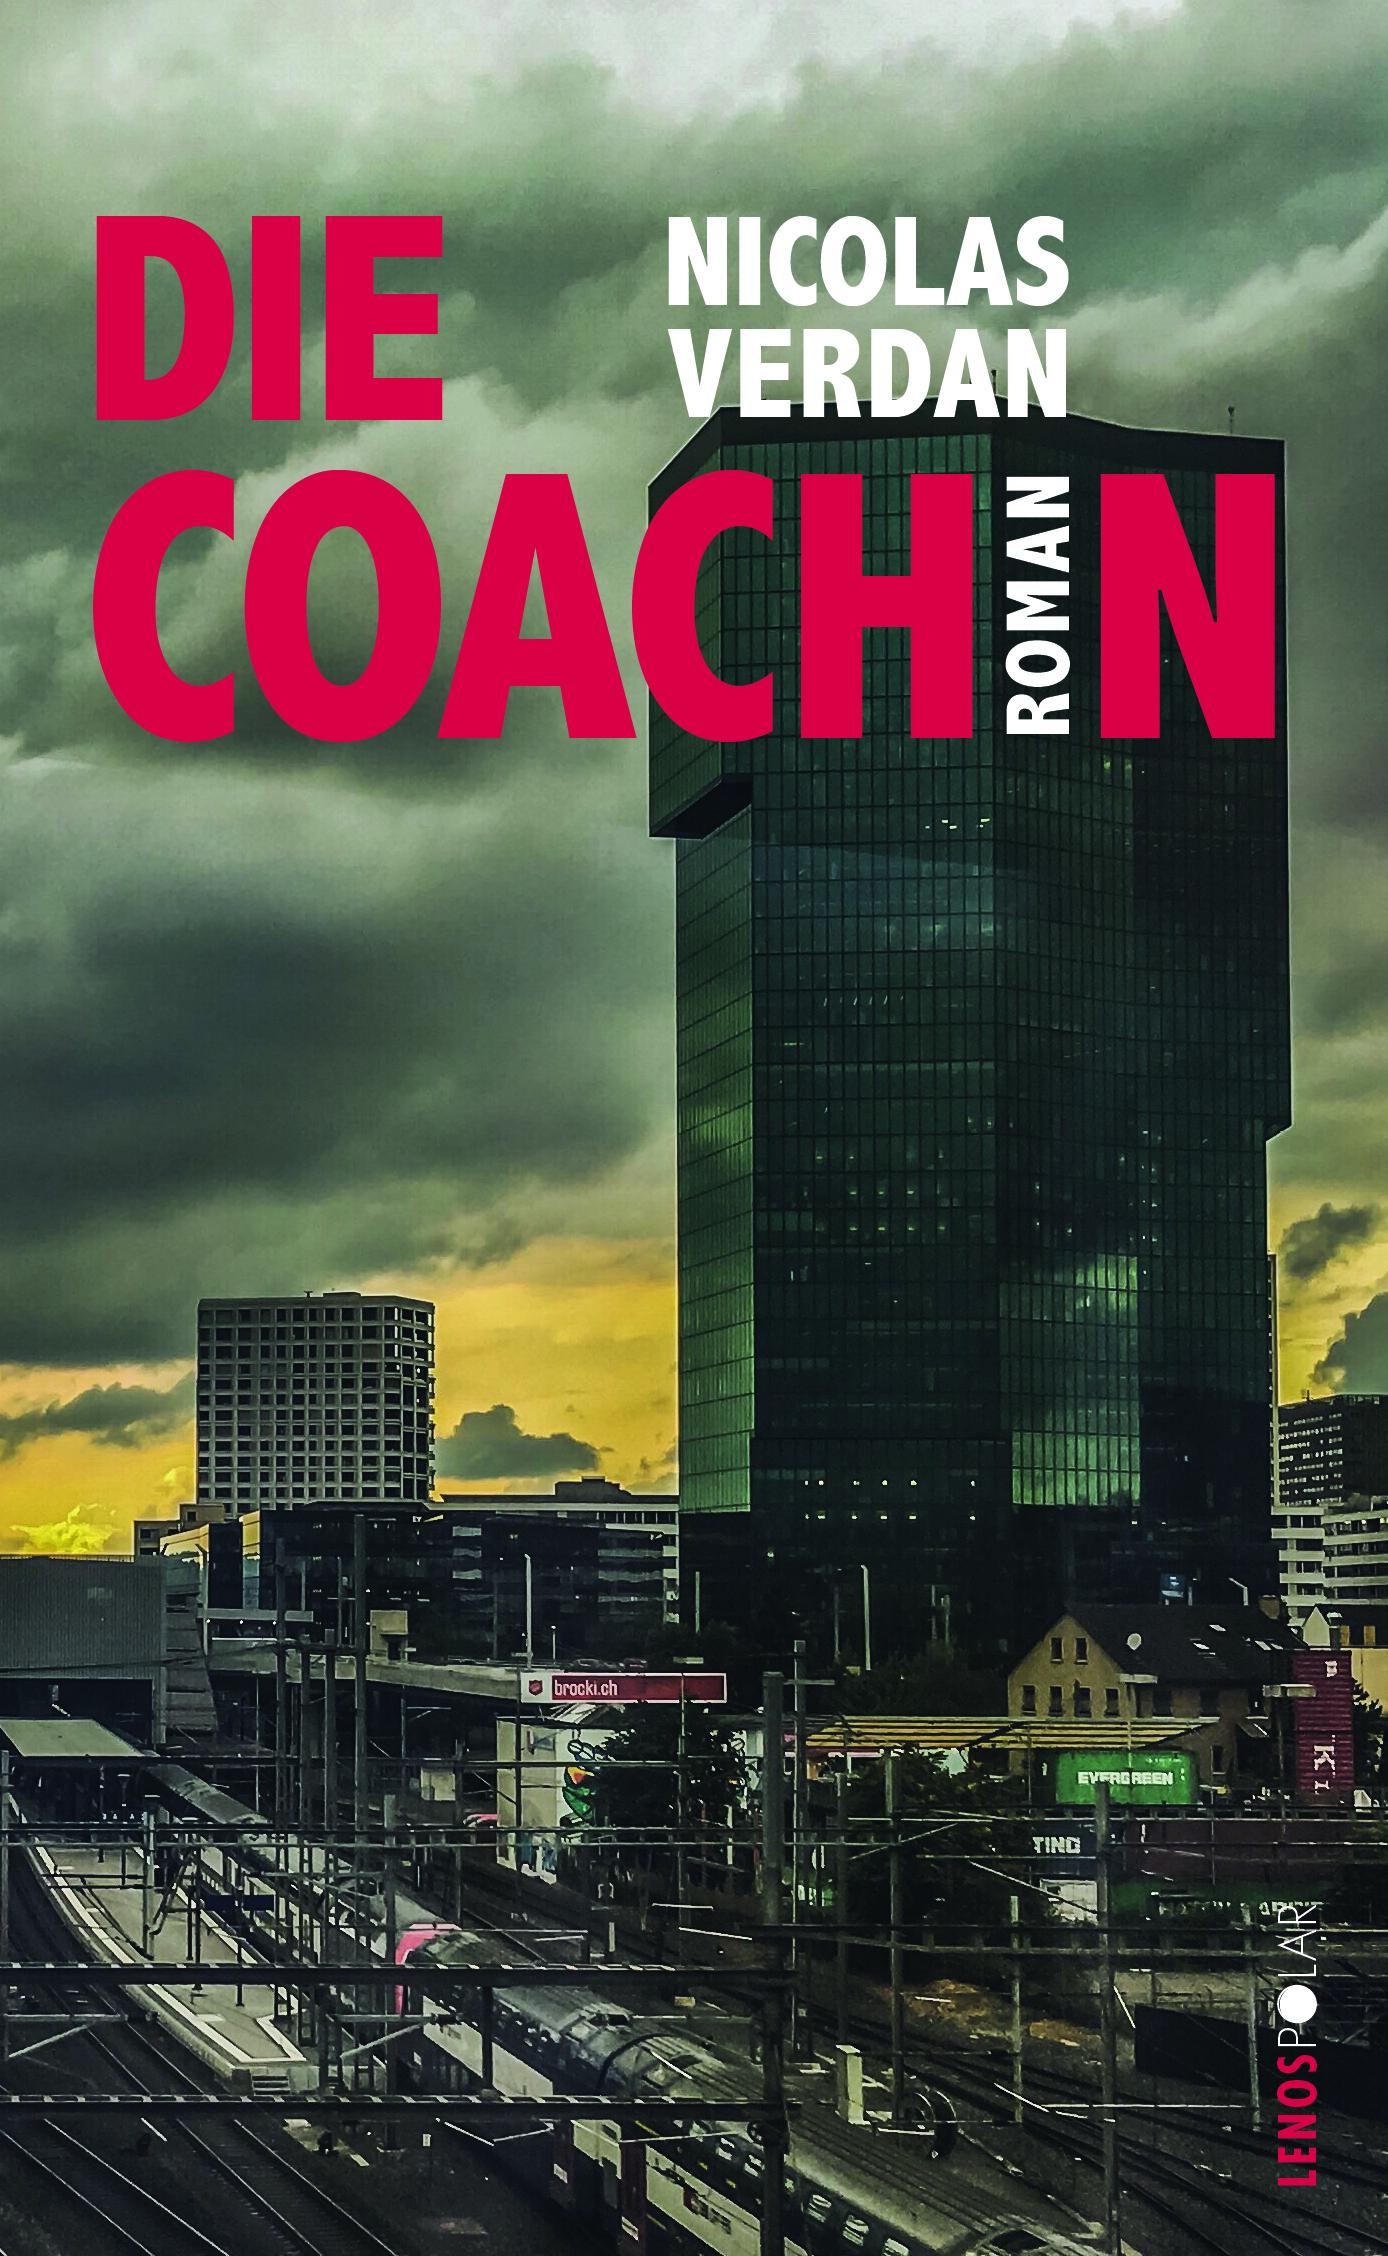 Die Coachin